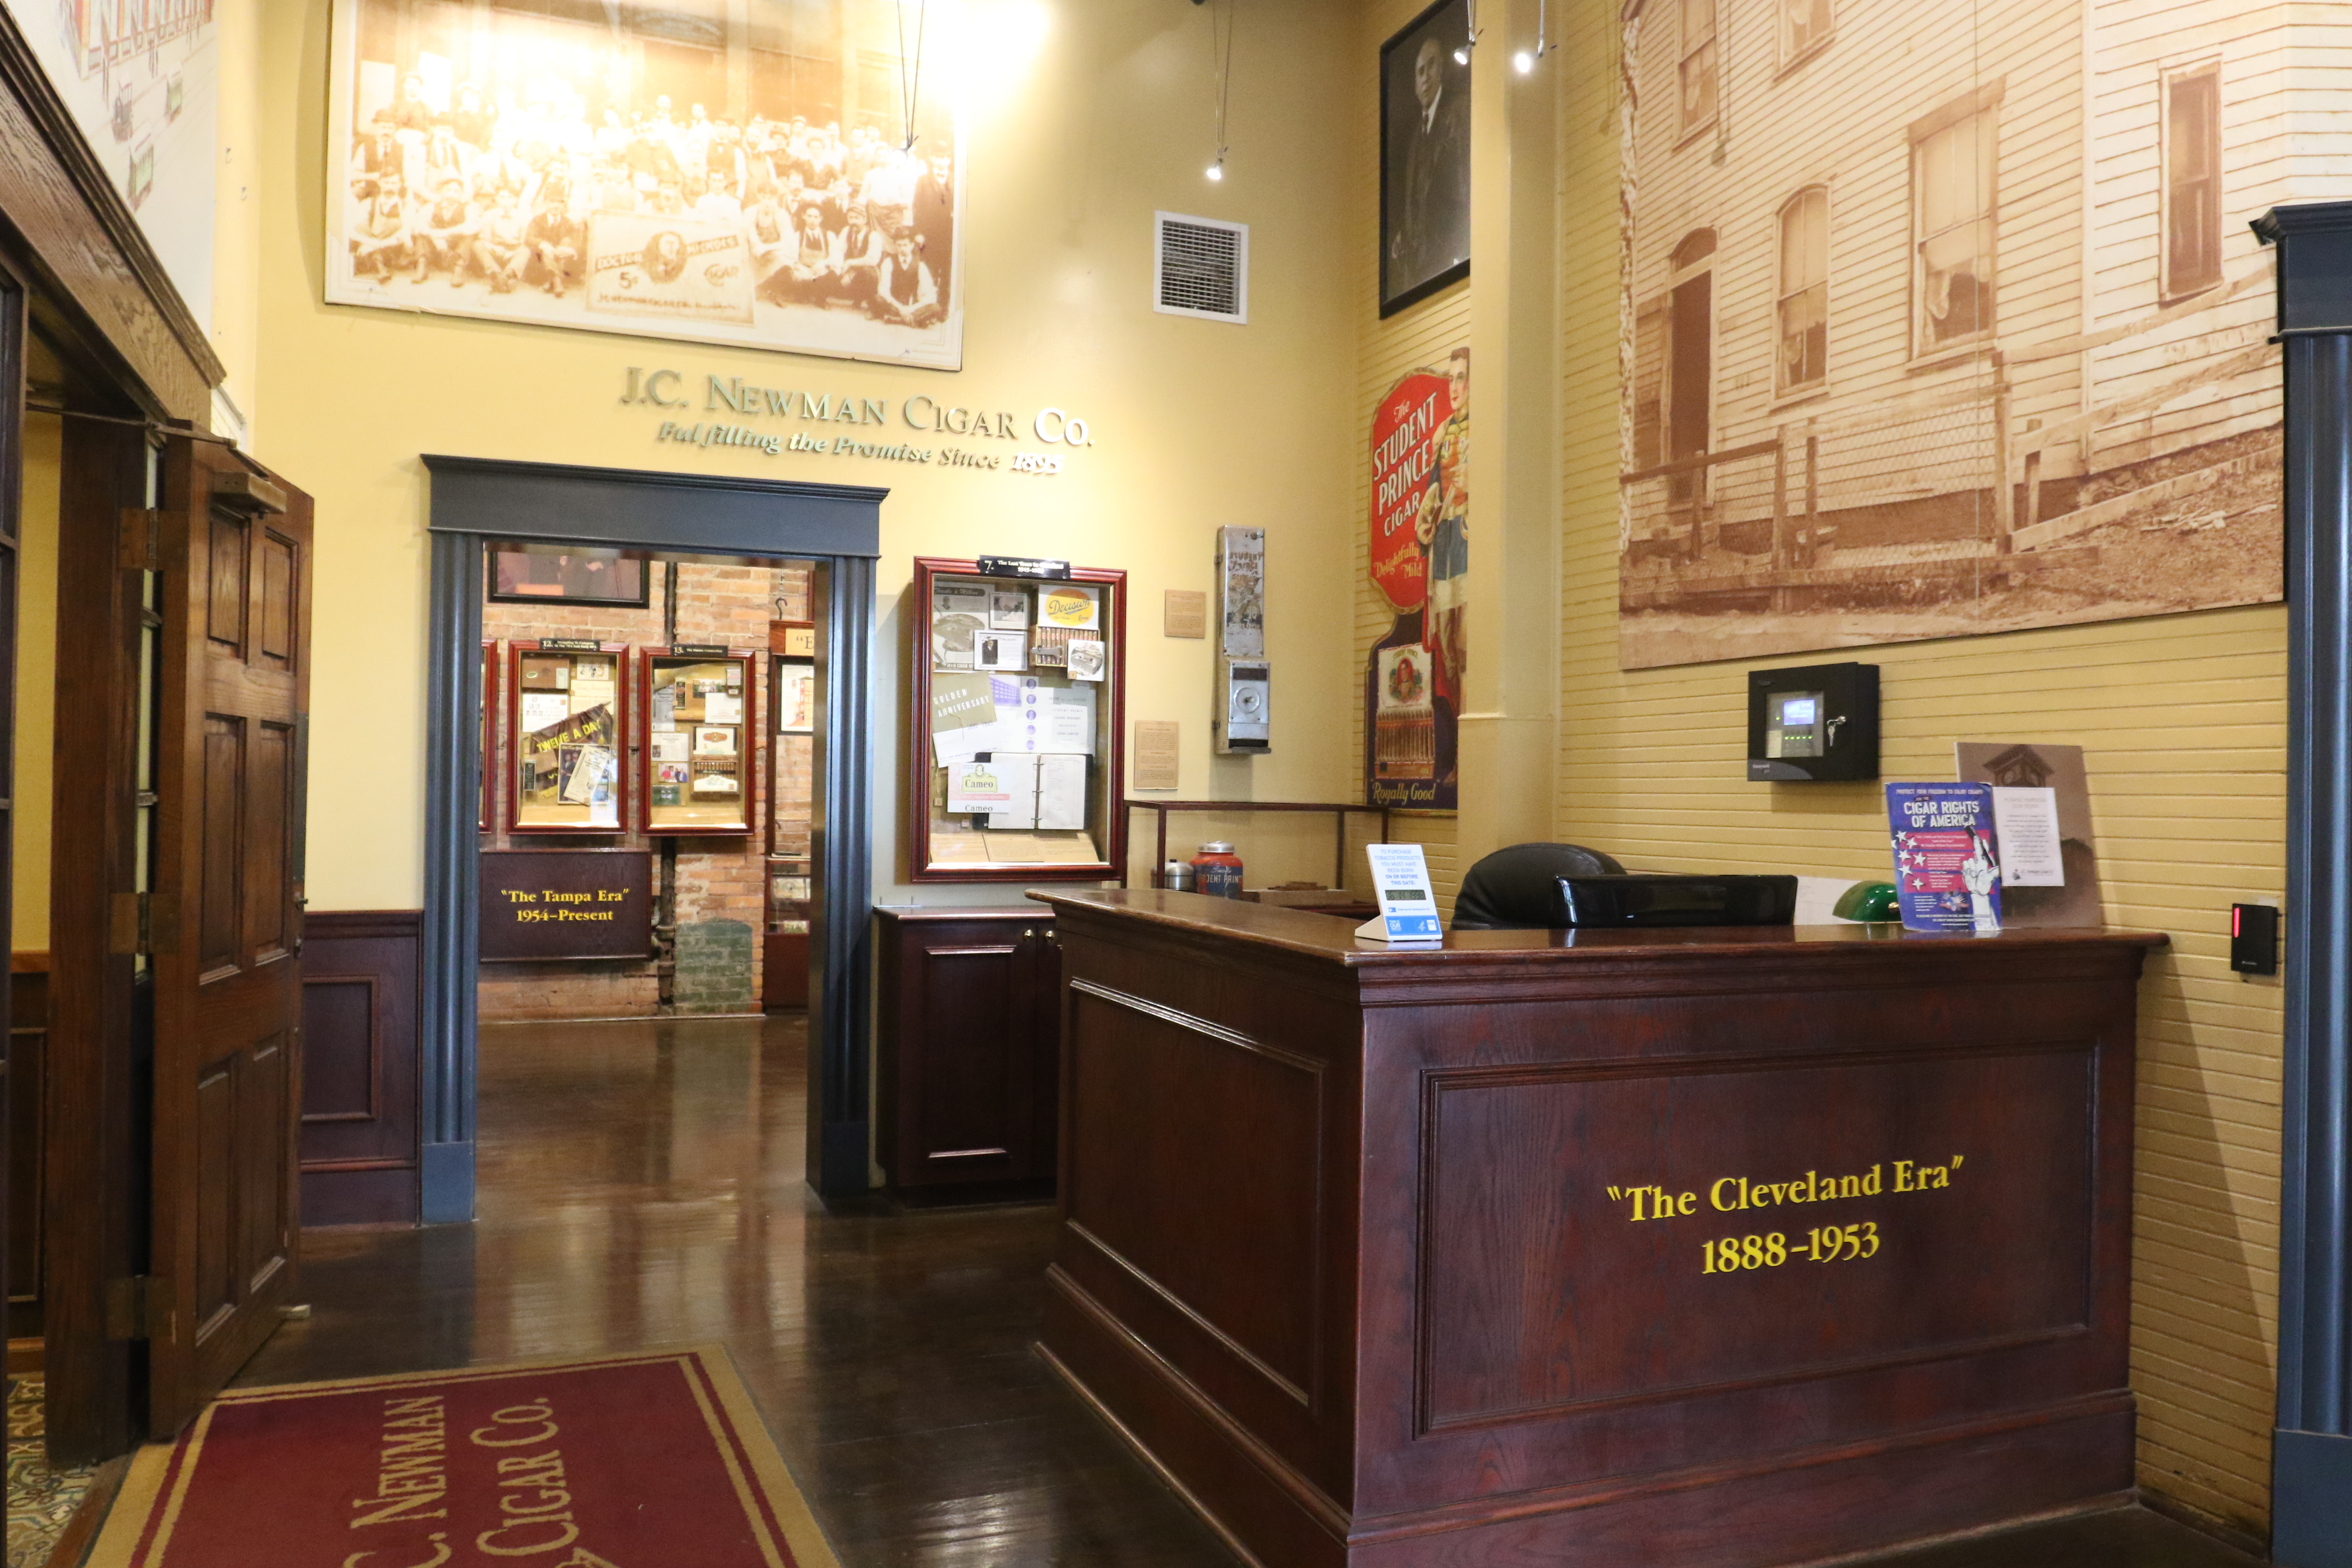 cigar factory museum